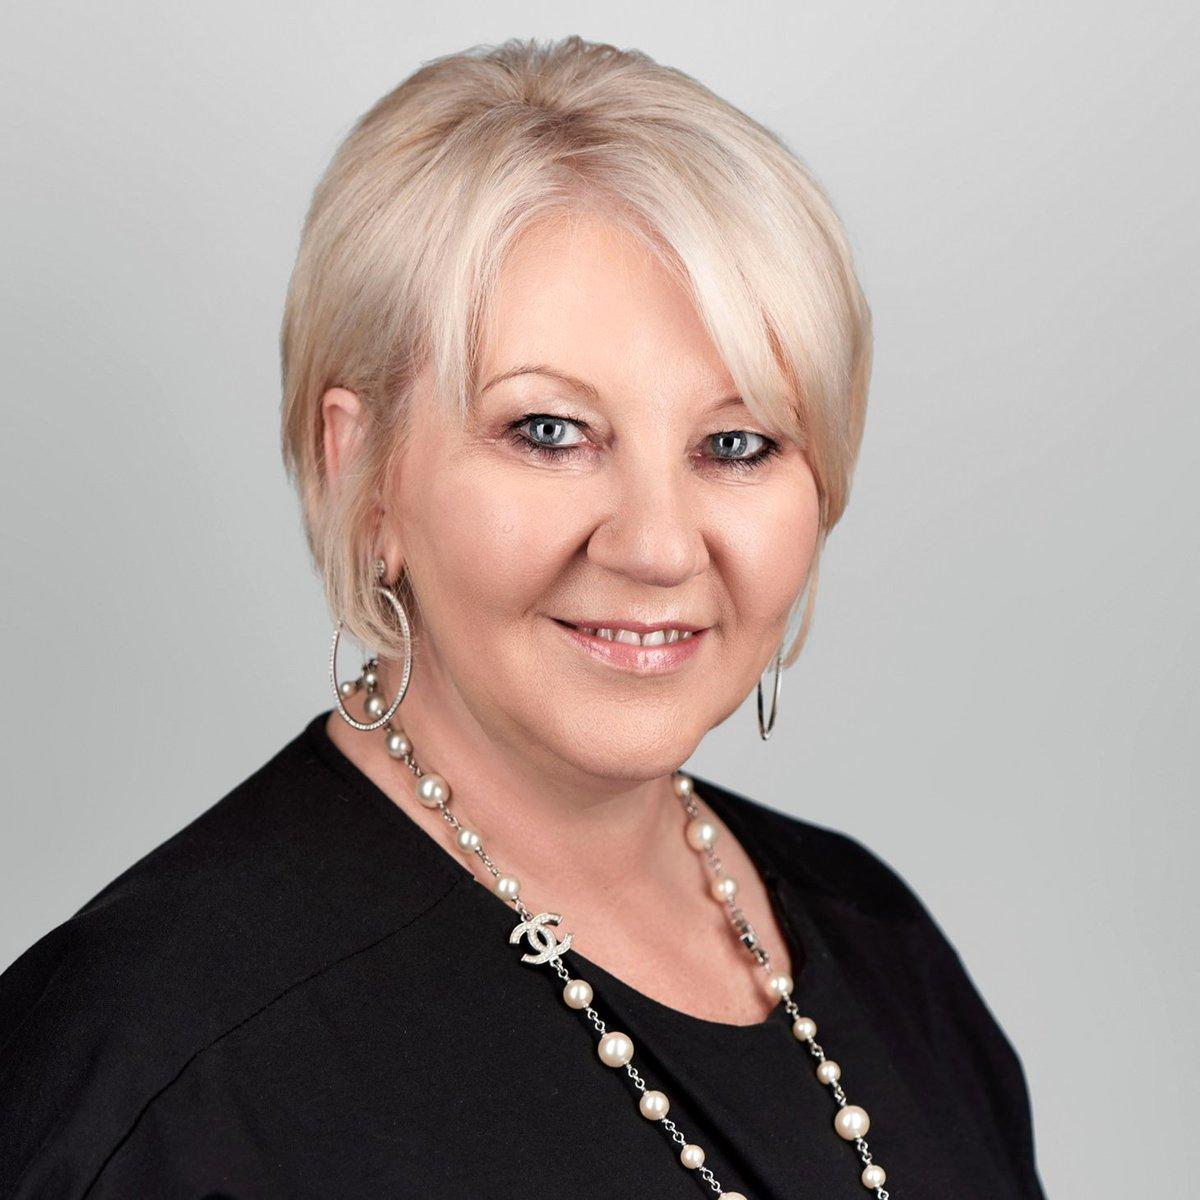 Read more about eg&#39;s Founder &amp; CEO, @ElizabethGooch MBE on #WorldEntrepreneursDay...  http:// egoptimize.com/about-eg-solut ions-plc/ &nbsp; …  #tech #womenintech  #BTRTG<br>http://pic.twitter.com/4rAQUDSNaq